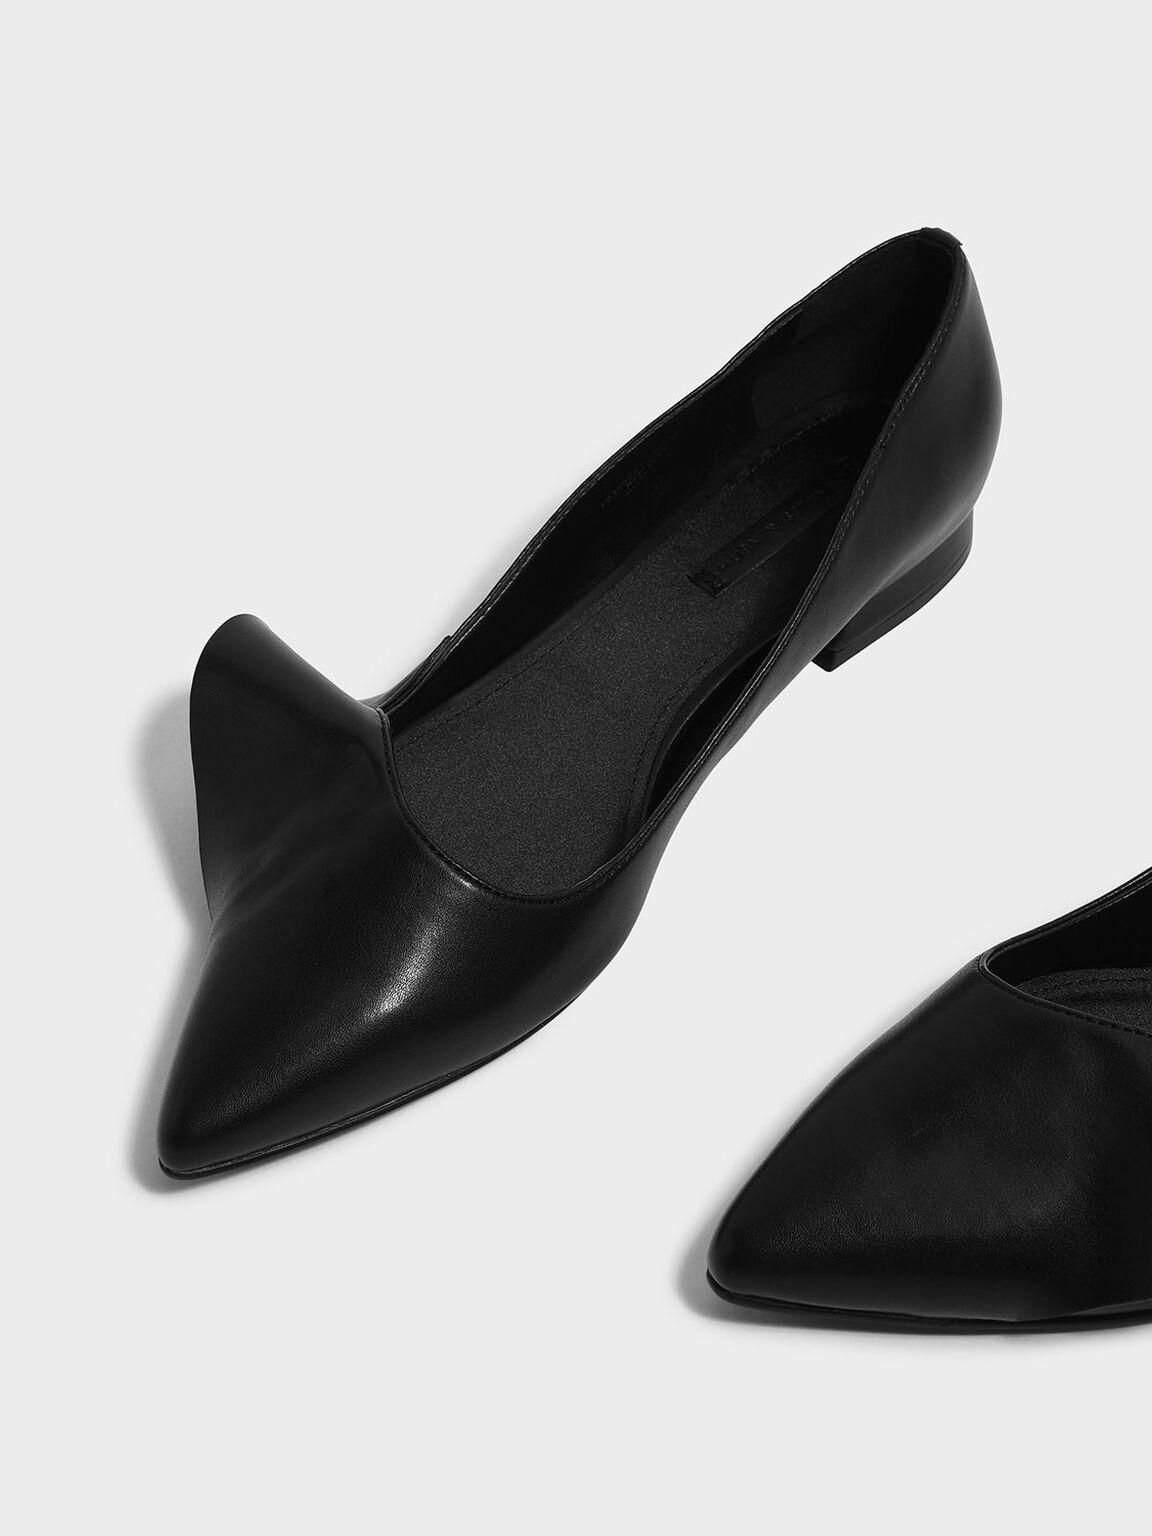 Ruffle Detail Pointed Flats, Black, hi-res